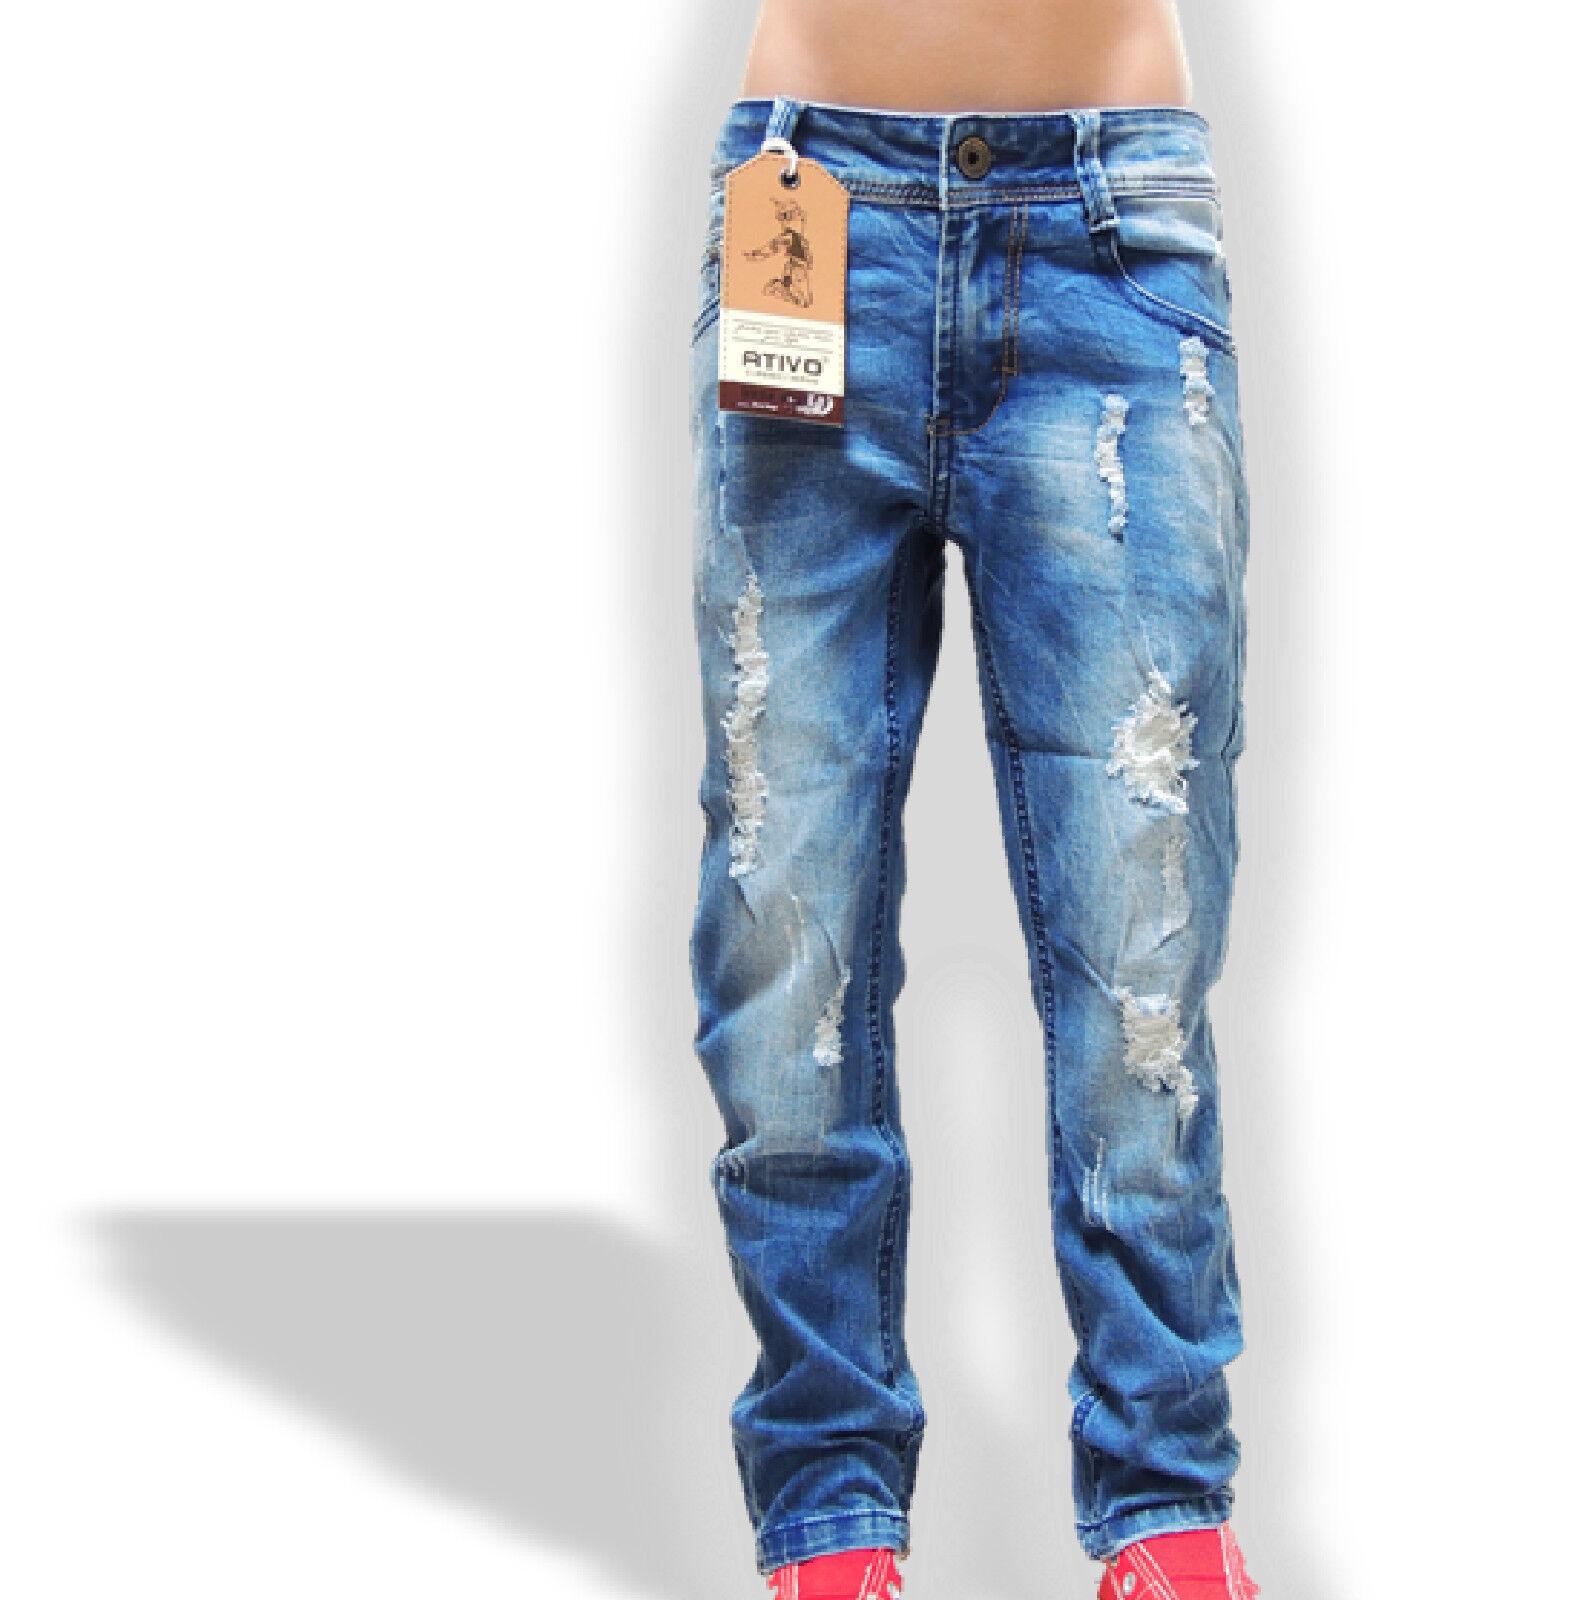 Jungen Jeanshose Test Vergleich +++ Jungen Jeanshose günstig kaufen! 3f13054f1b